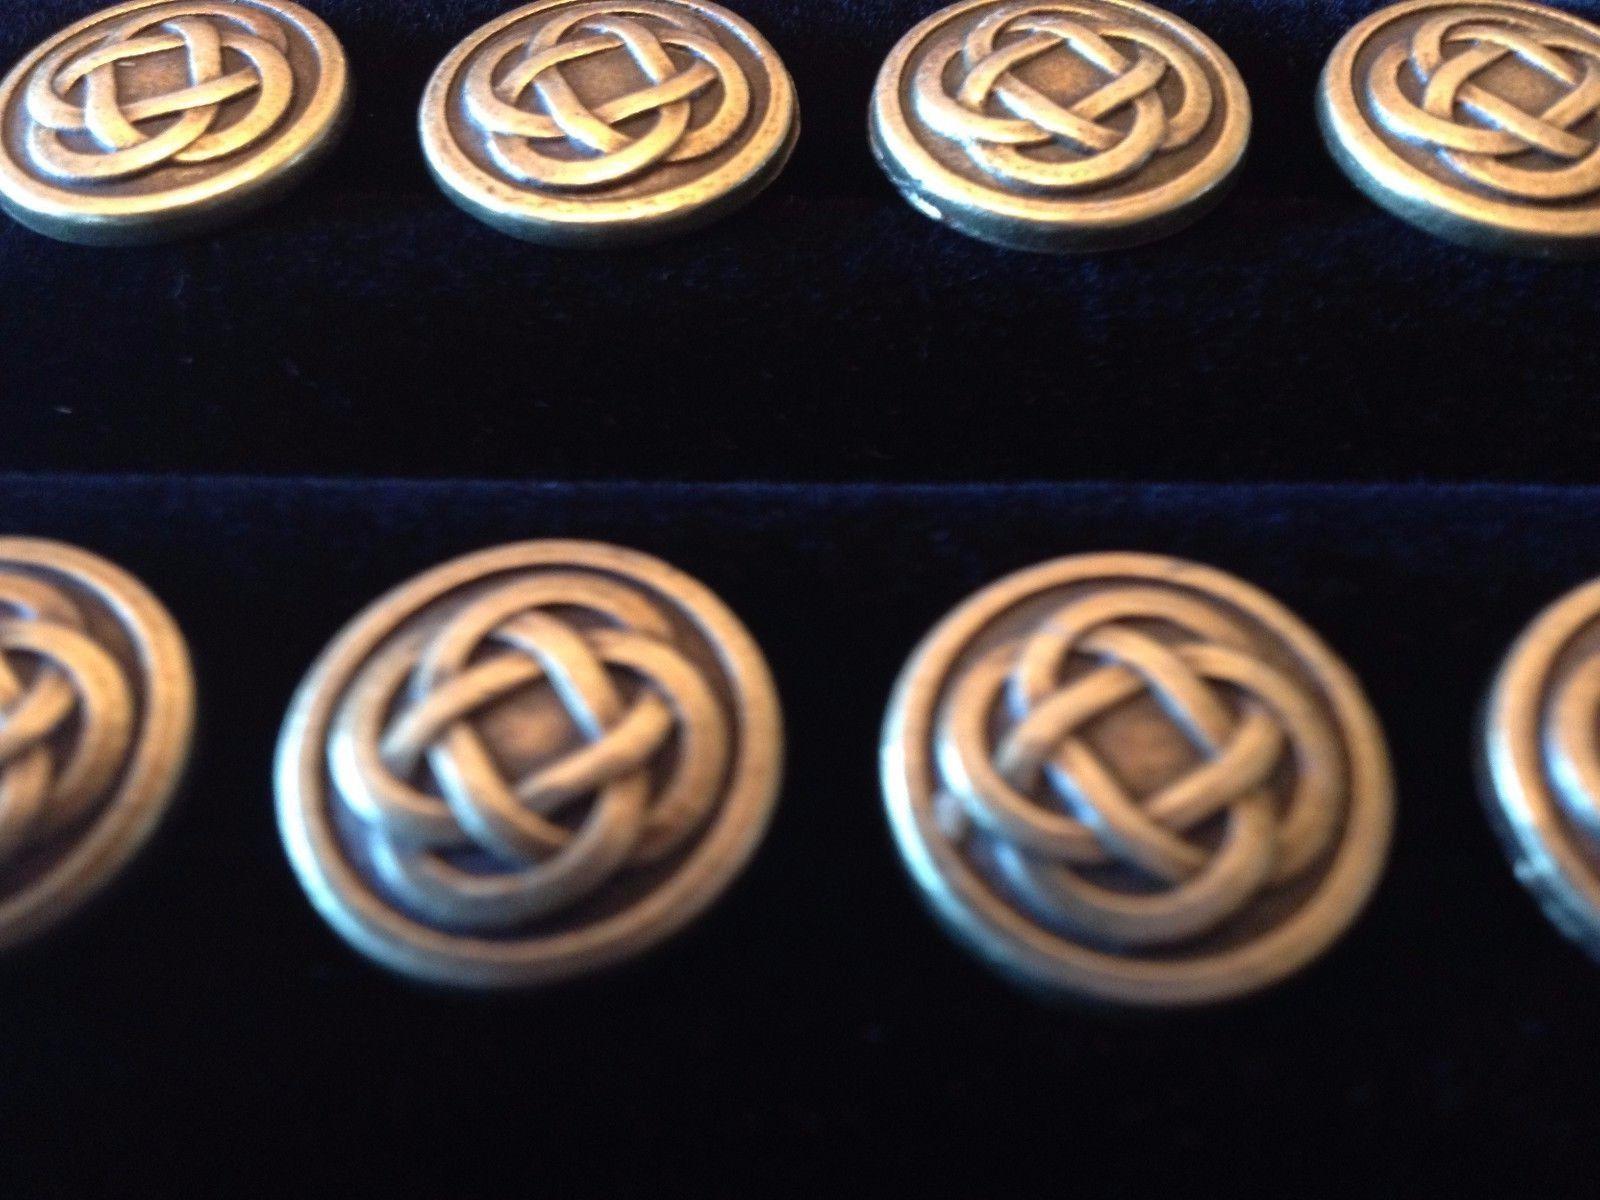 Bronze Metal Celtic Knotwork Buttons 1/2 inch British Classic Irish Set of 8